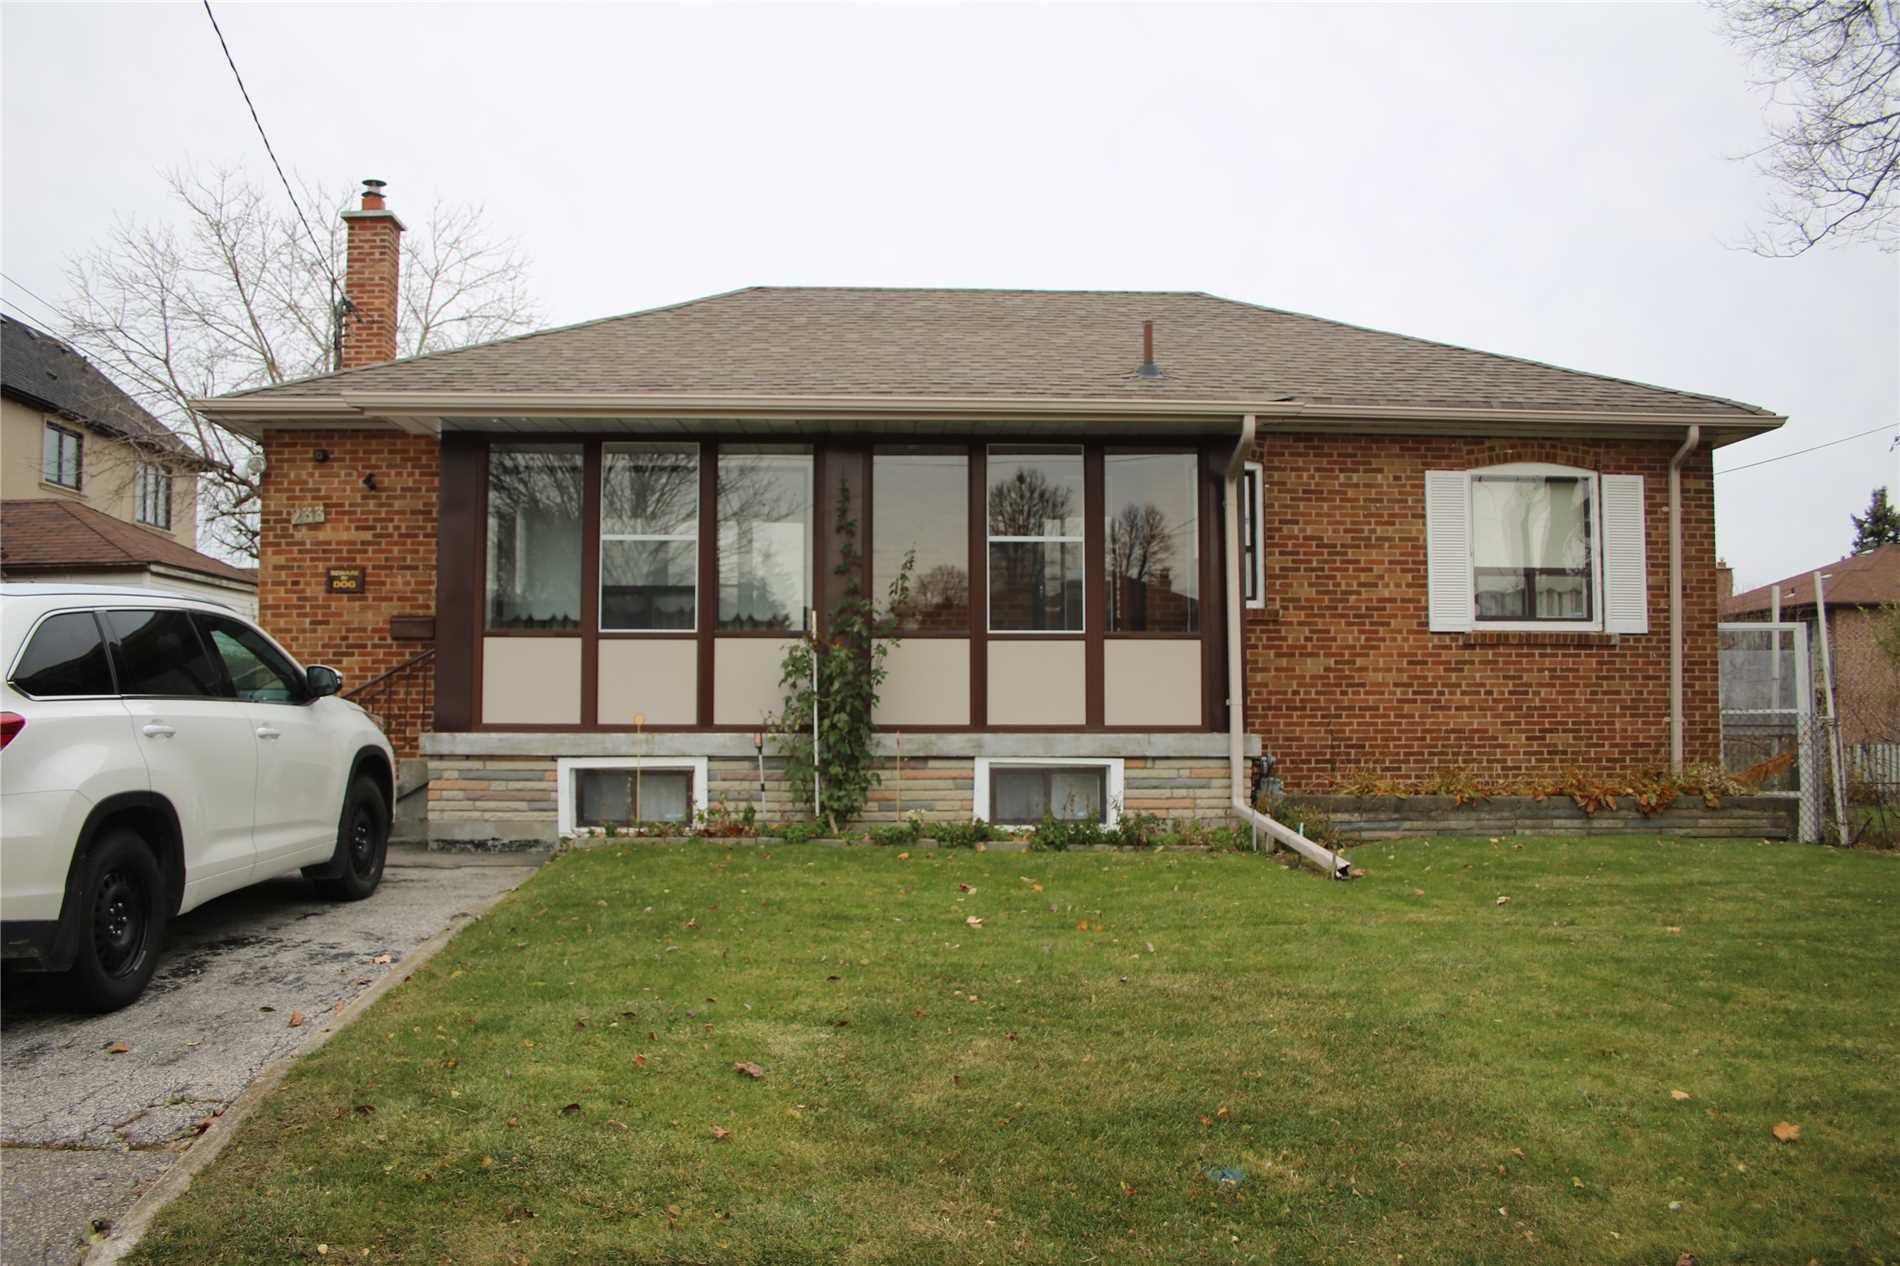 Main Photo: 233 Falstaff Avenue in Toronto: Maple Leaf House (Bungalow) for lease (Toronto W04)  : MLS®# W4304074